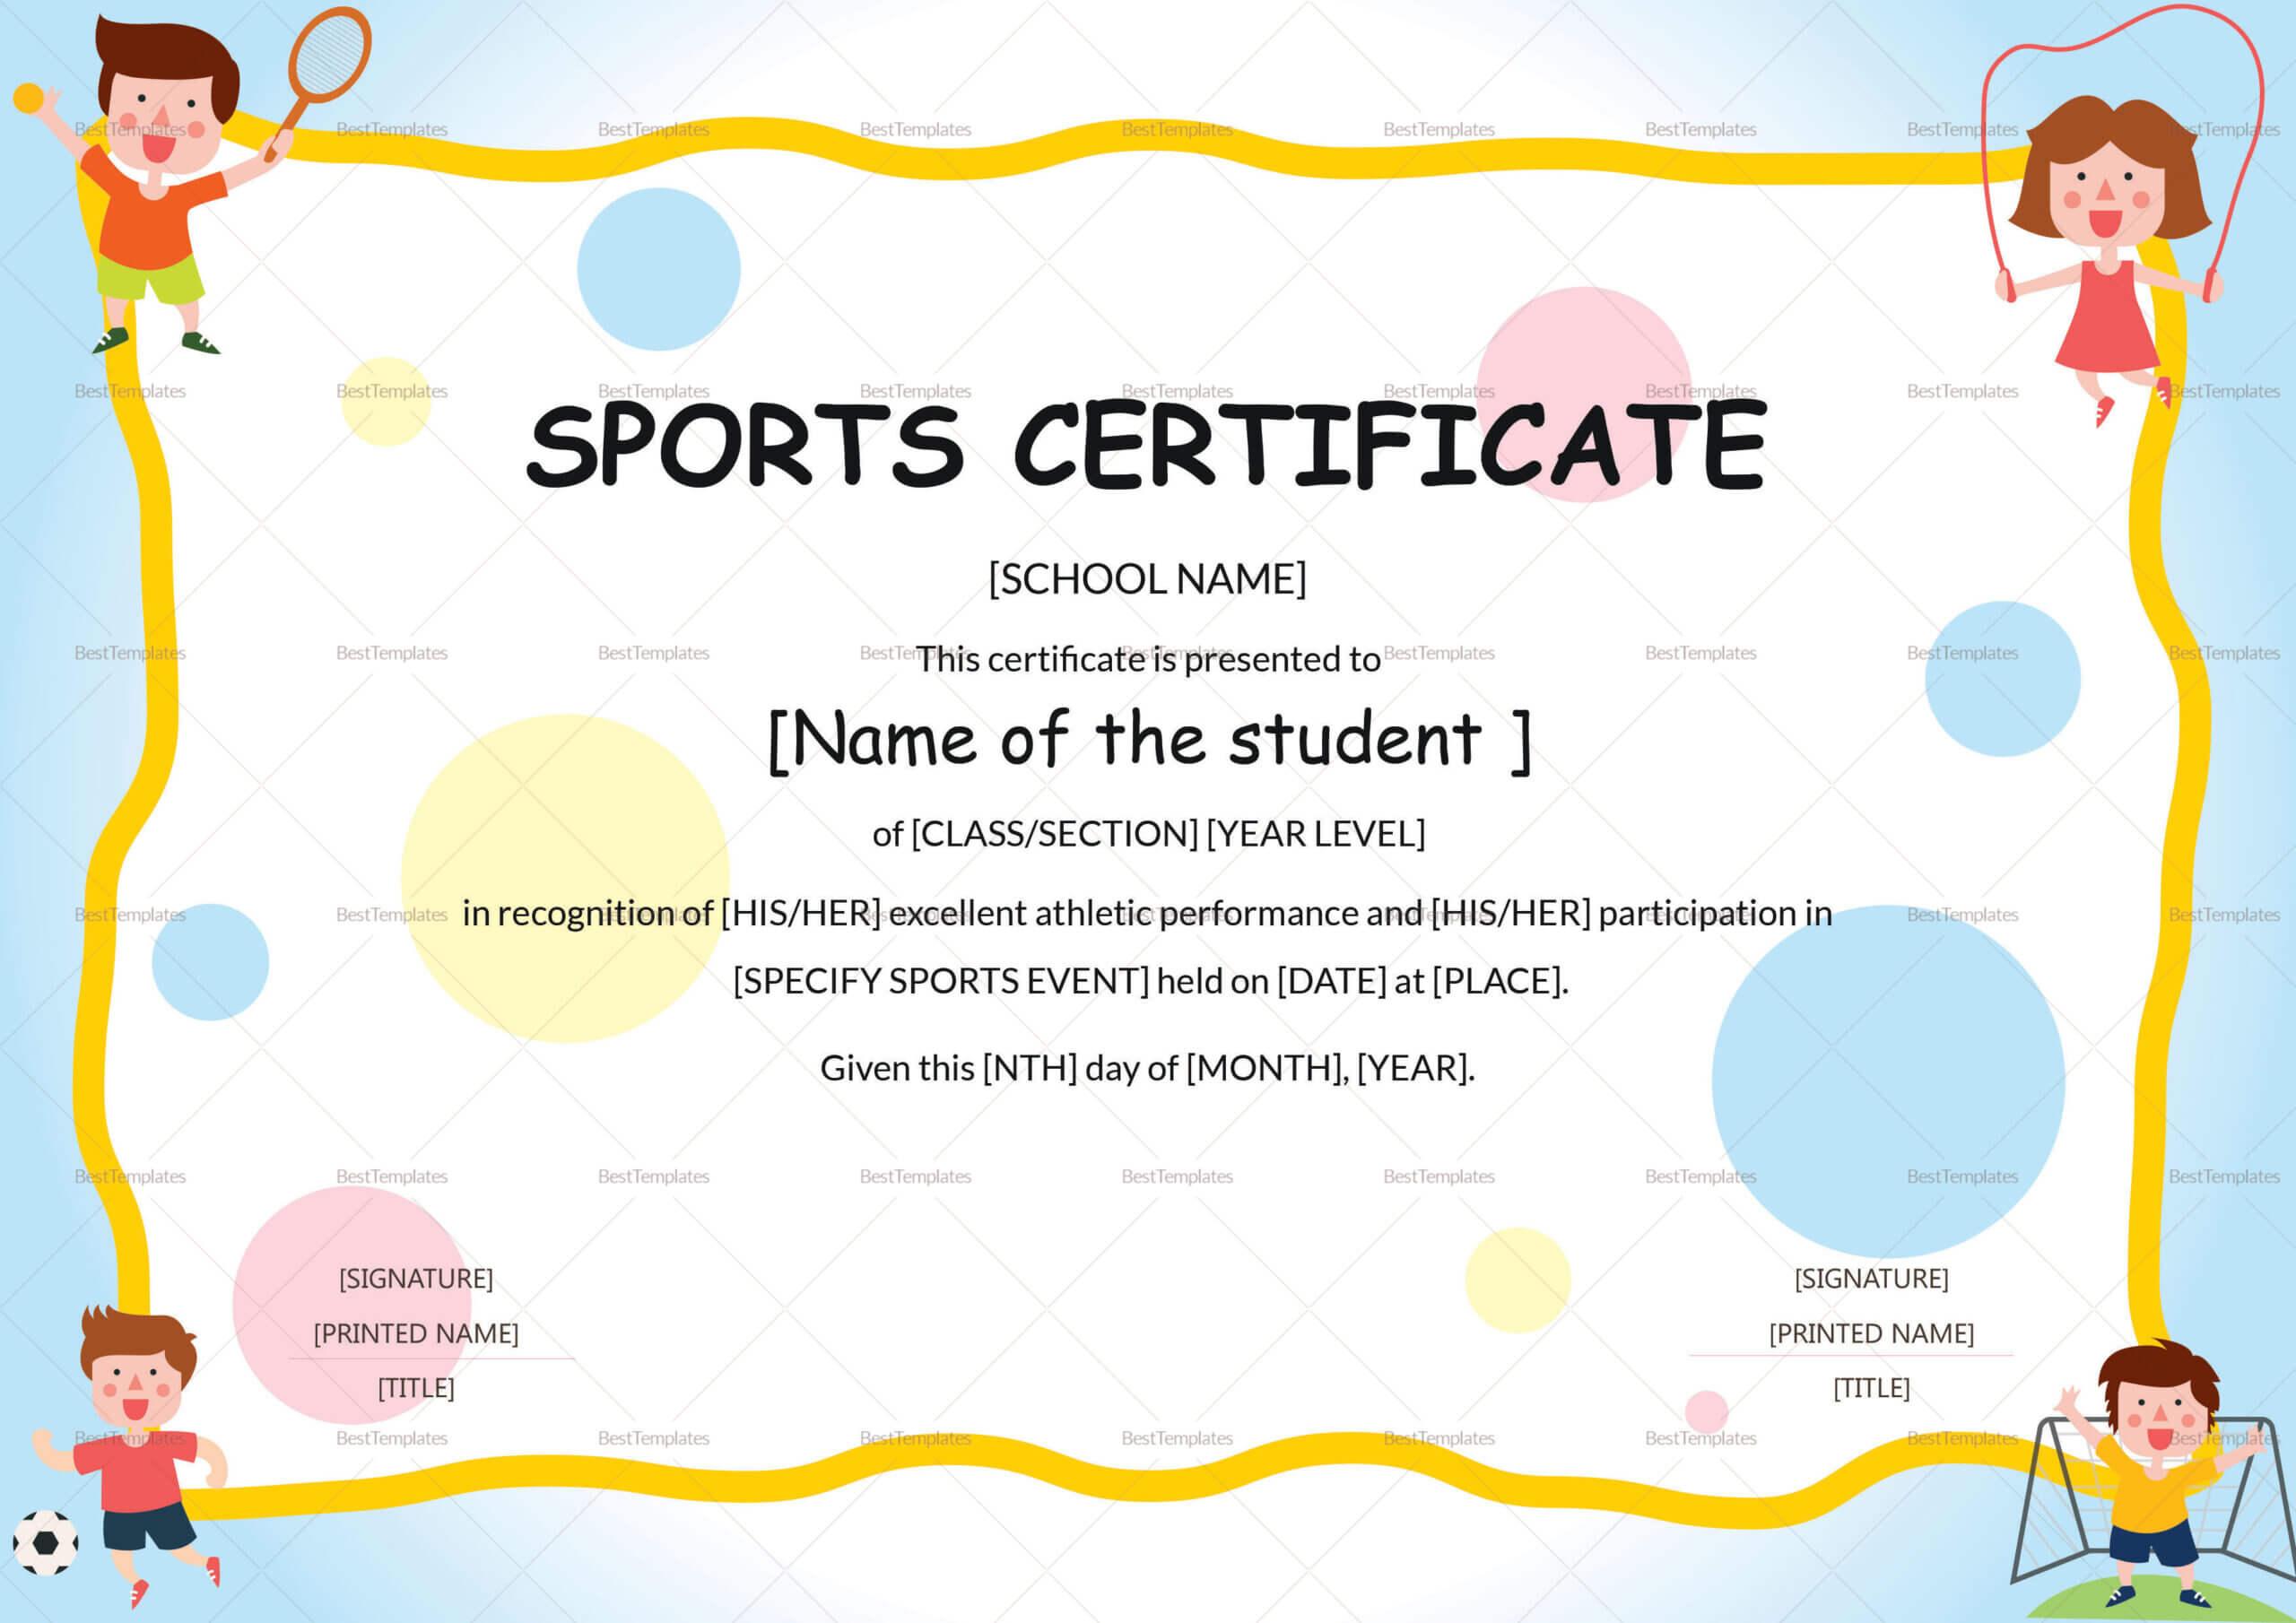 Sports Day Certificate Template - Yatay.horizonconsulting.co With Sports Day Certificate Templates Free